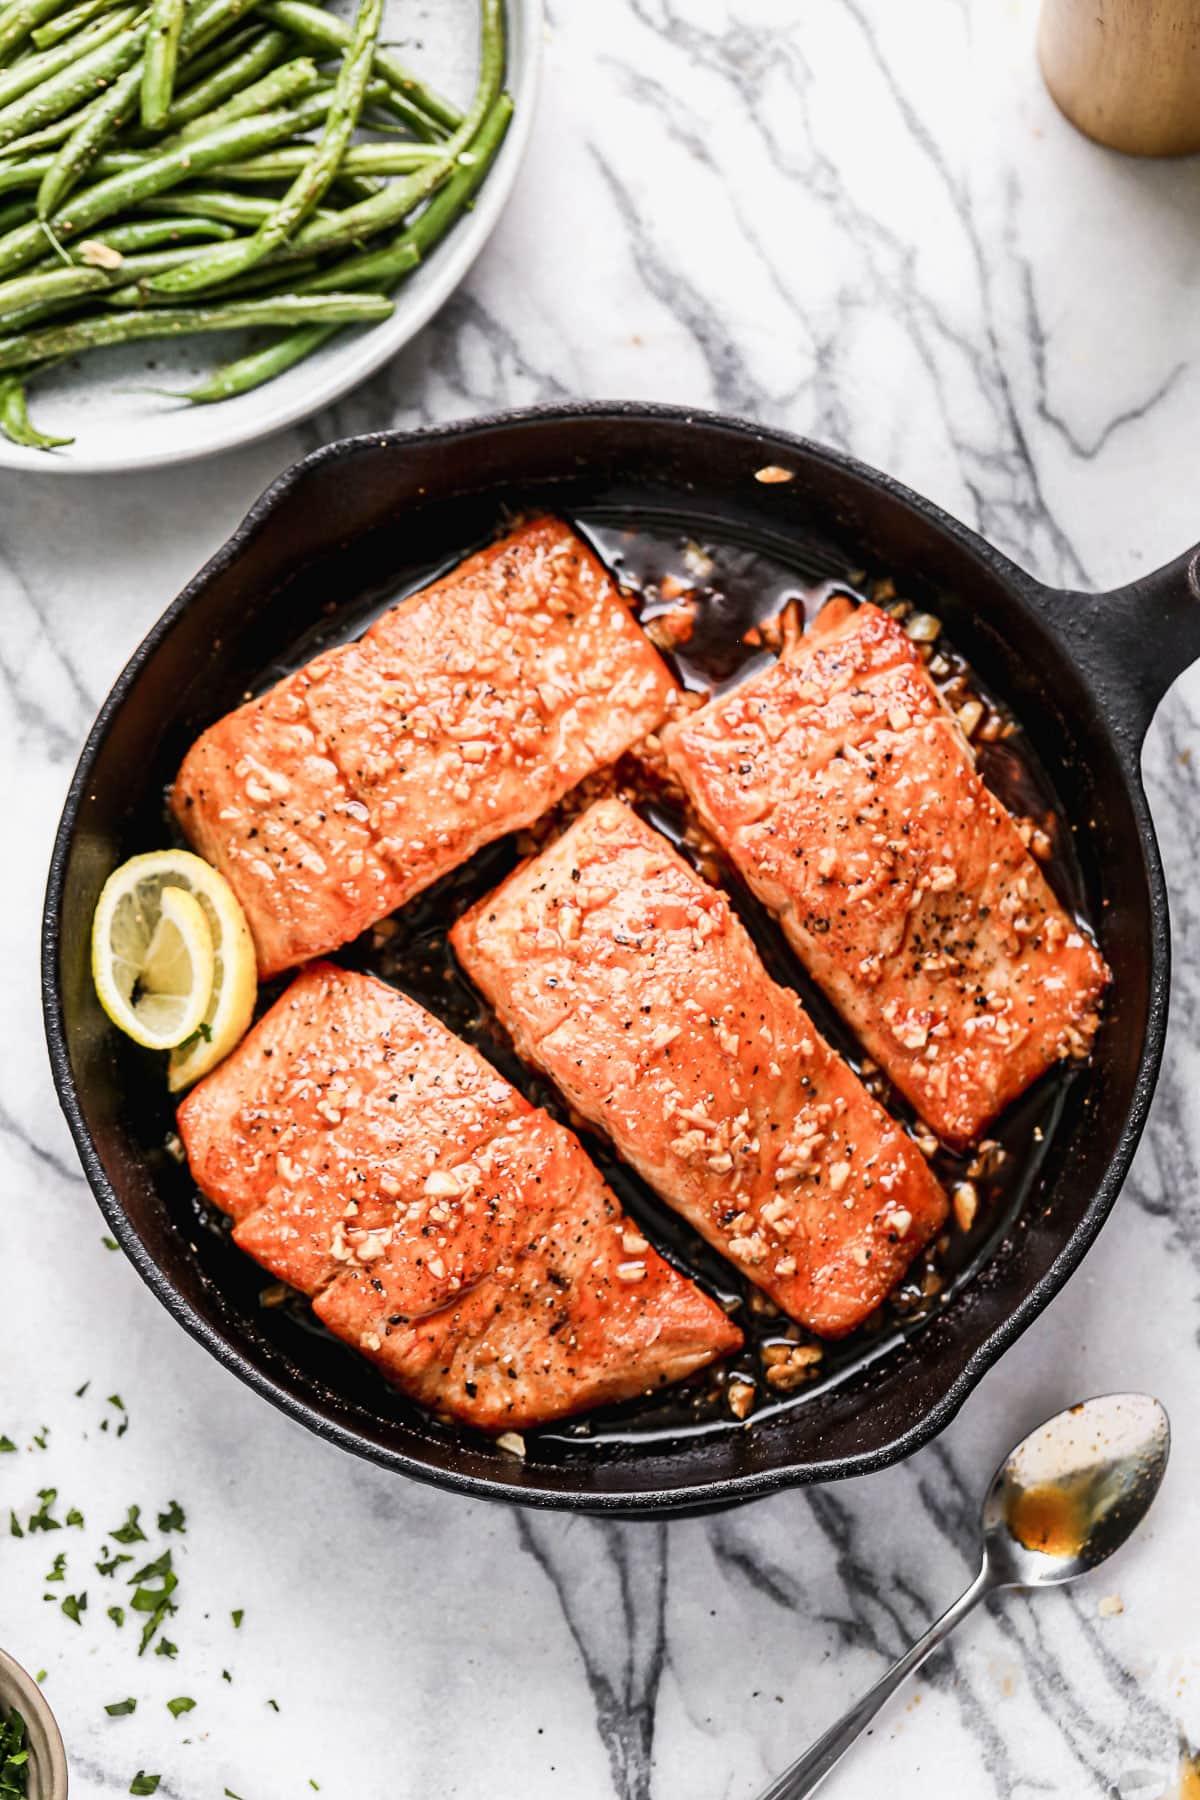 Honey garlic salmon fillets with lemon